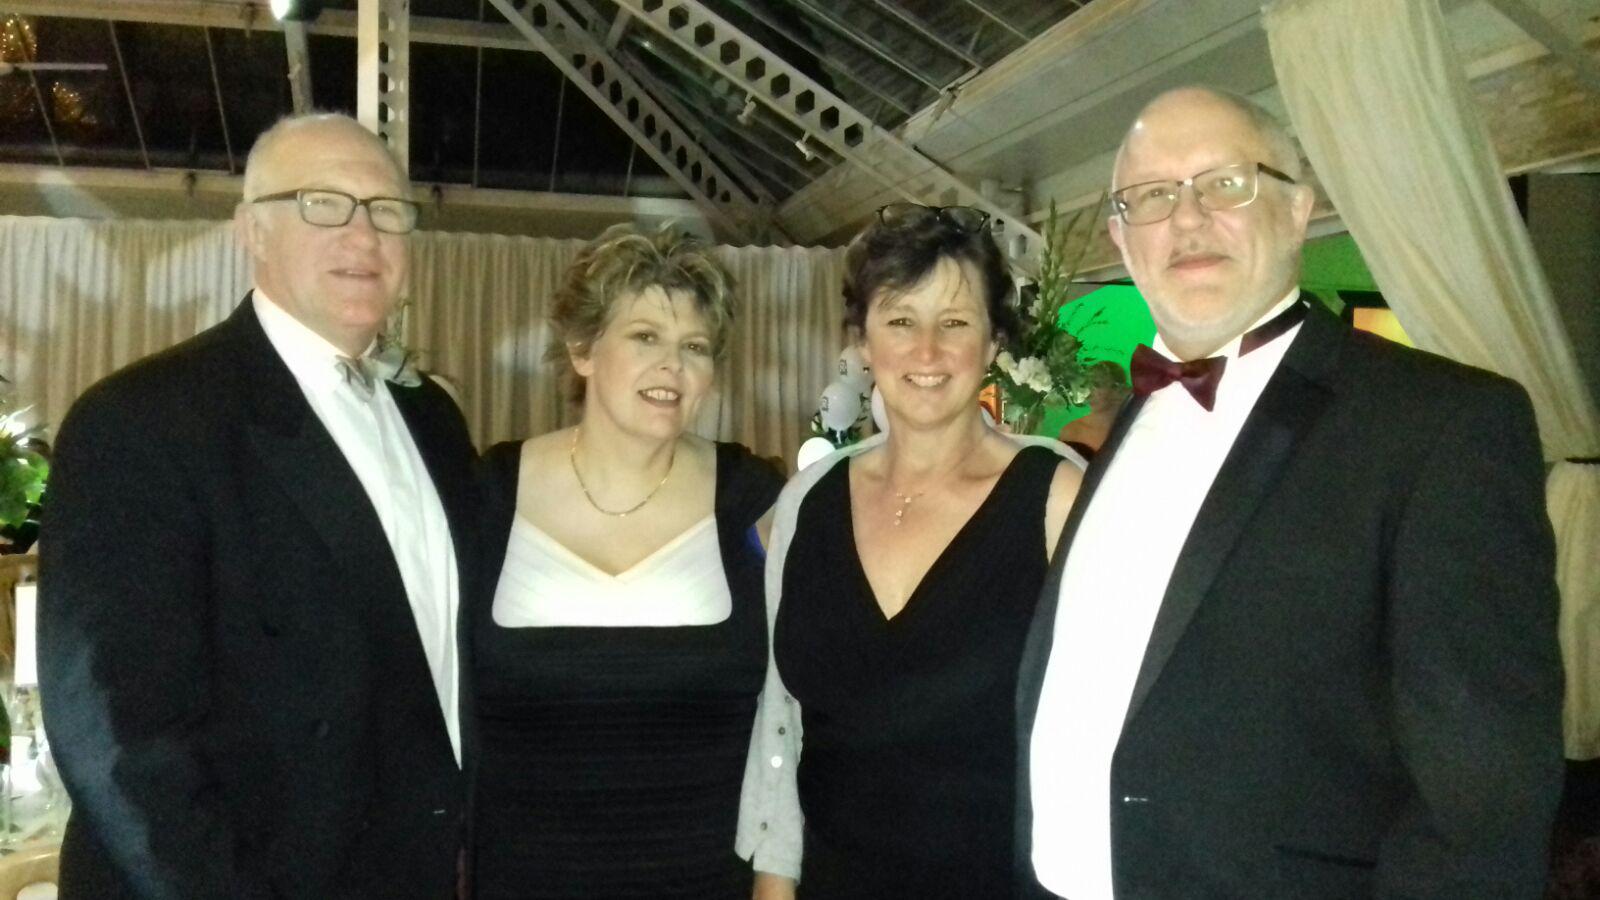 Carolyn Pennock second left and Nigel Upson far right